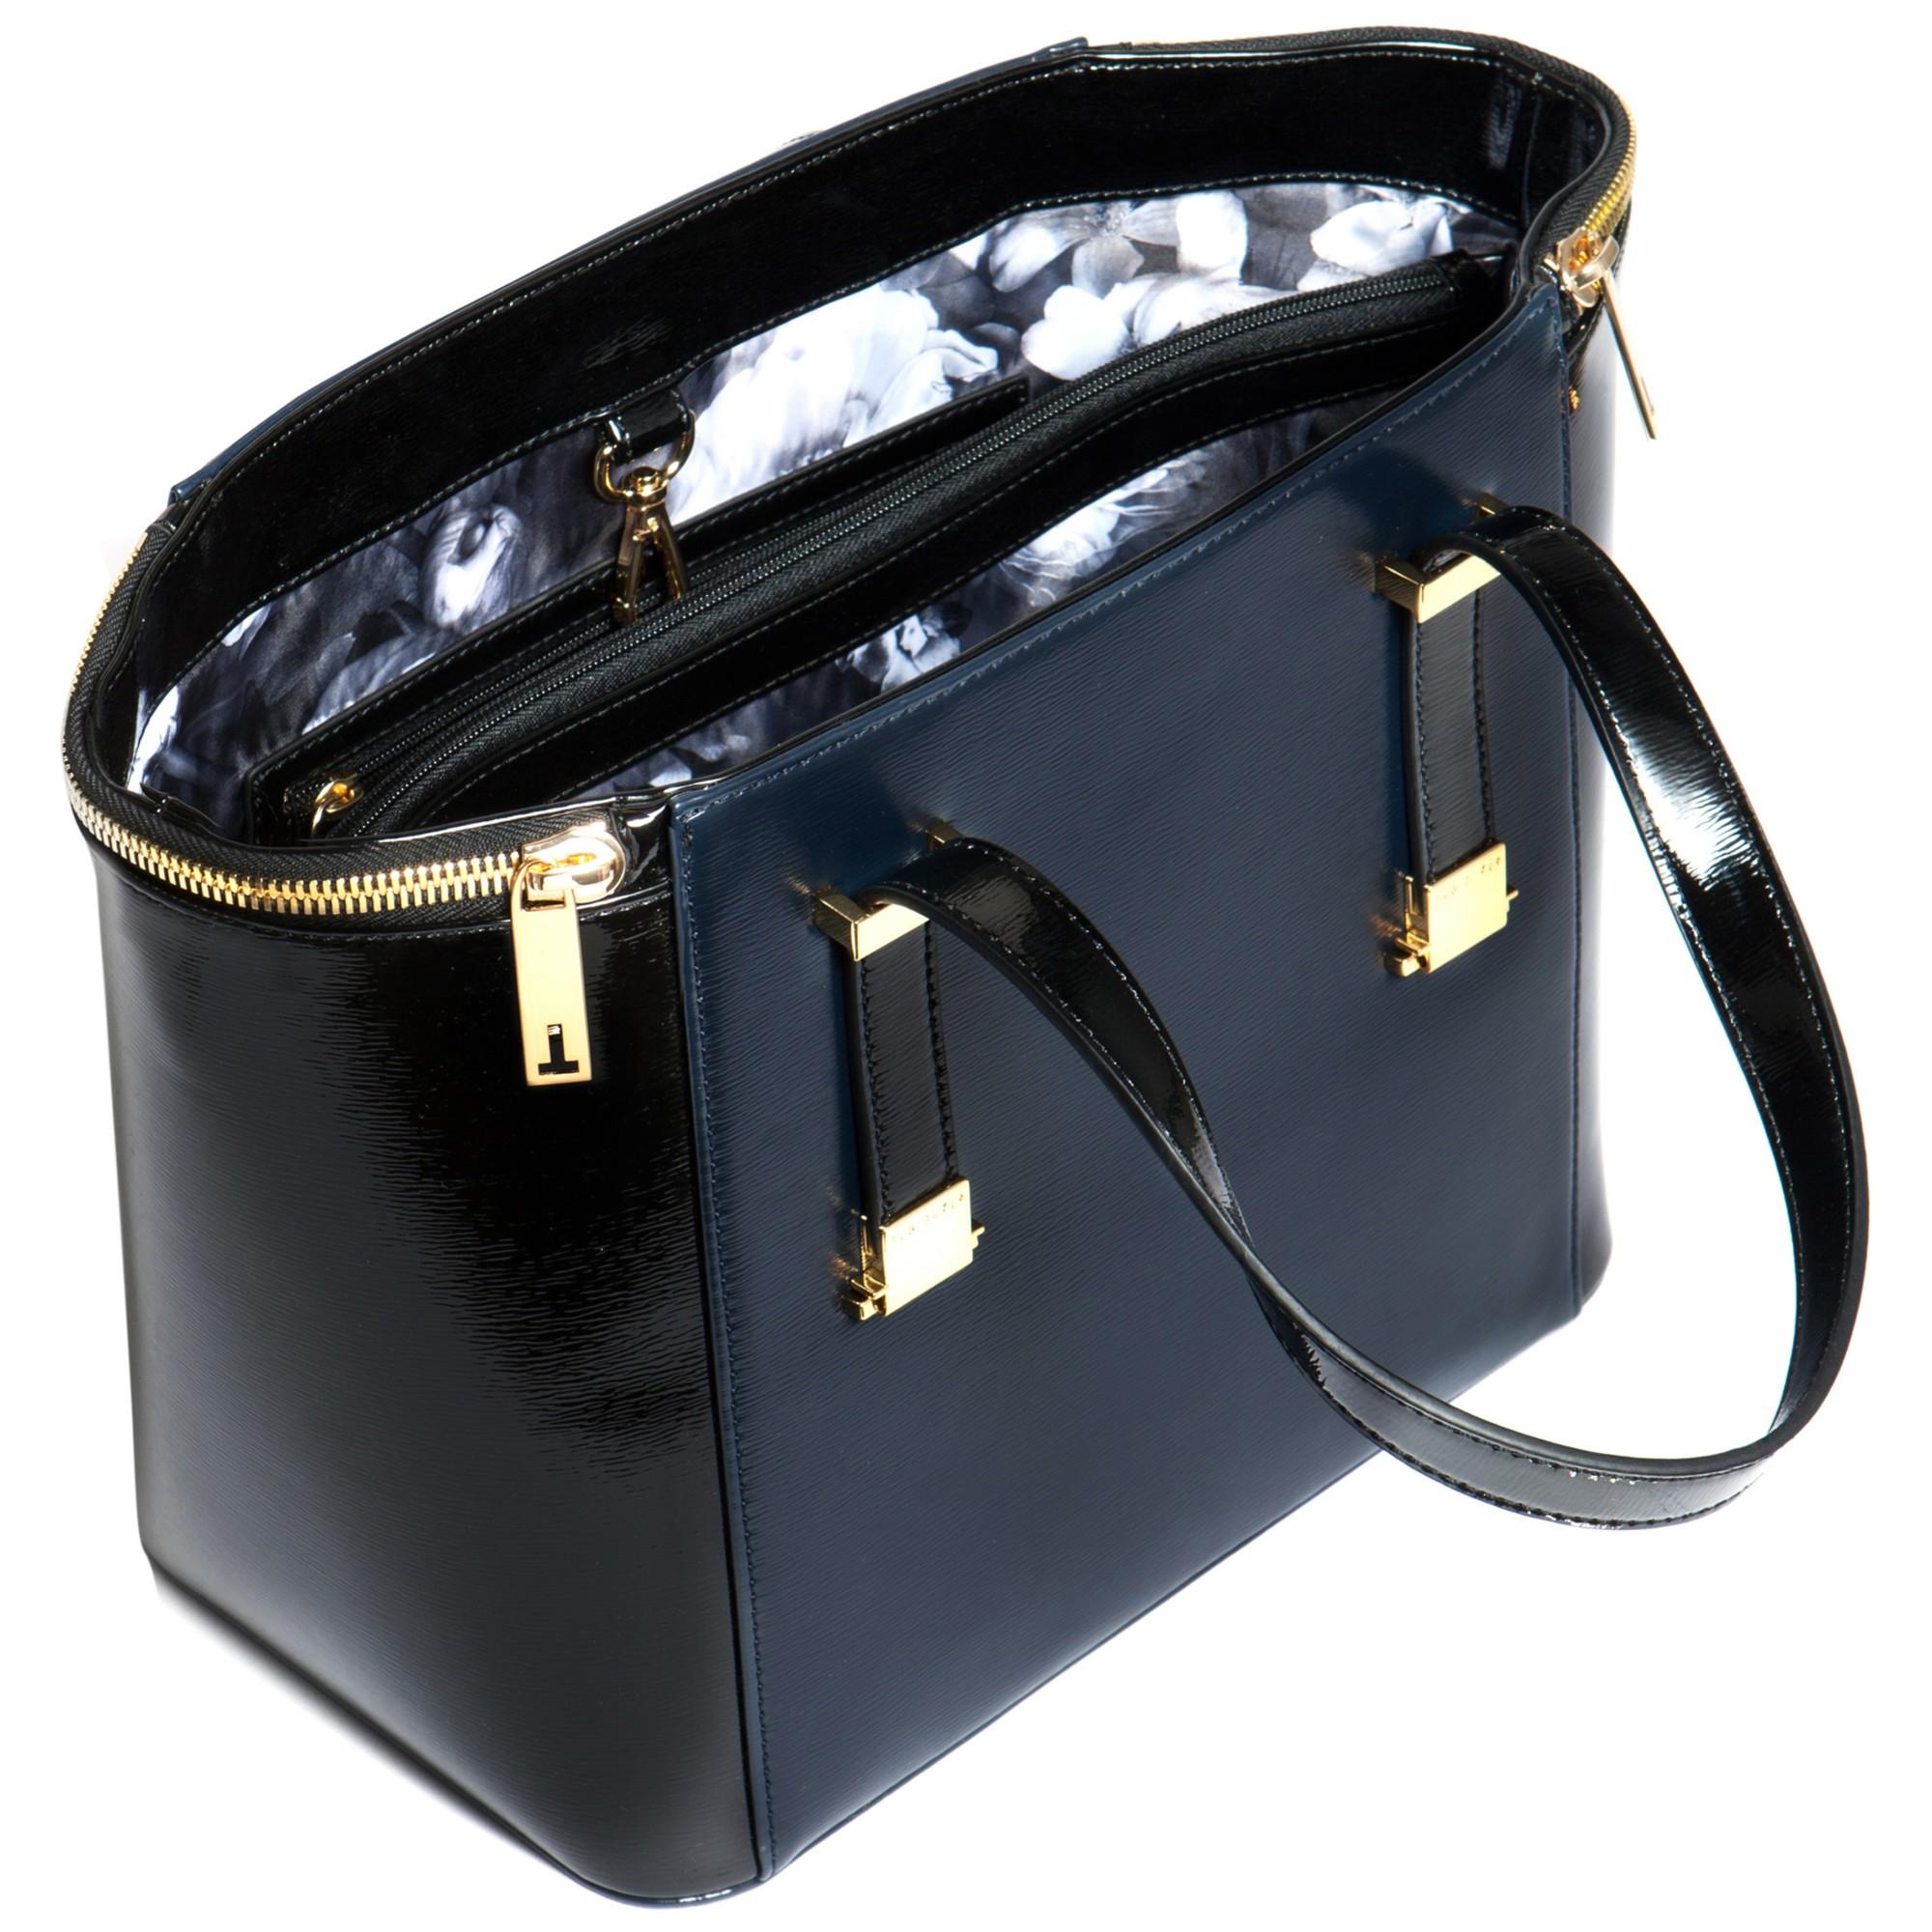 7b2c0450ec3c Ted Baker Morgan Adjustable Crosshatch Tote Bag in Blue - Lyst